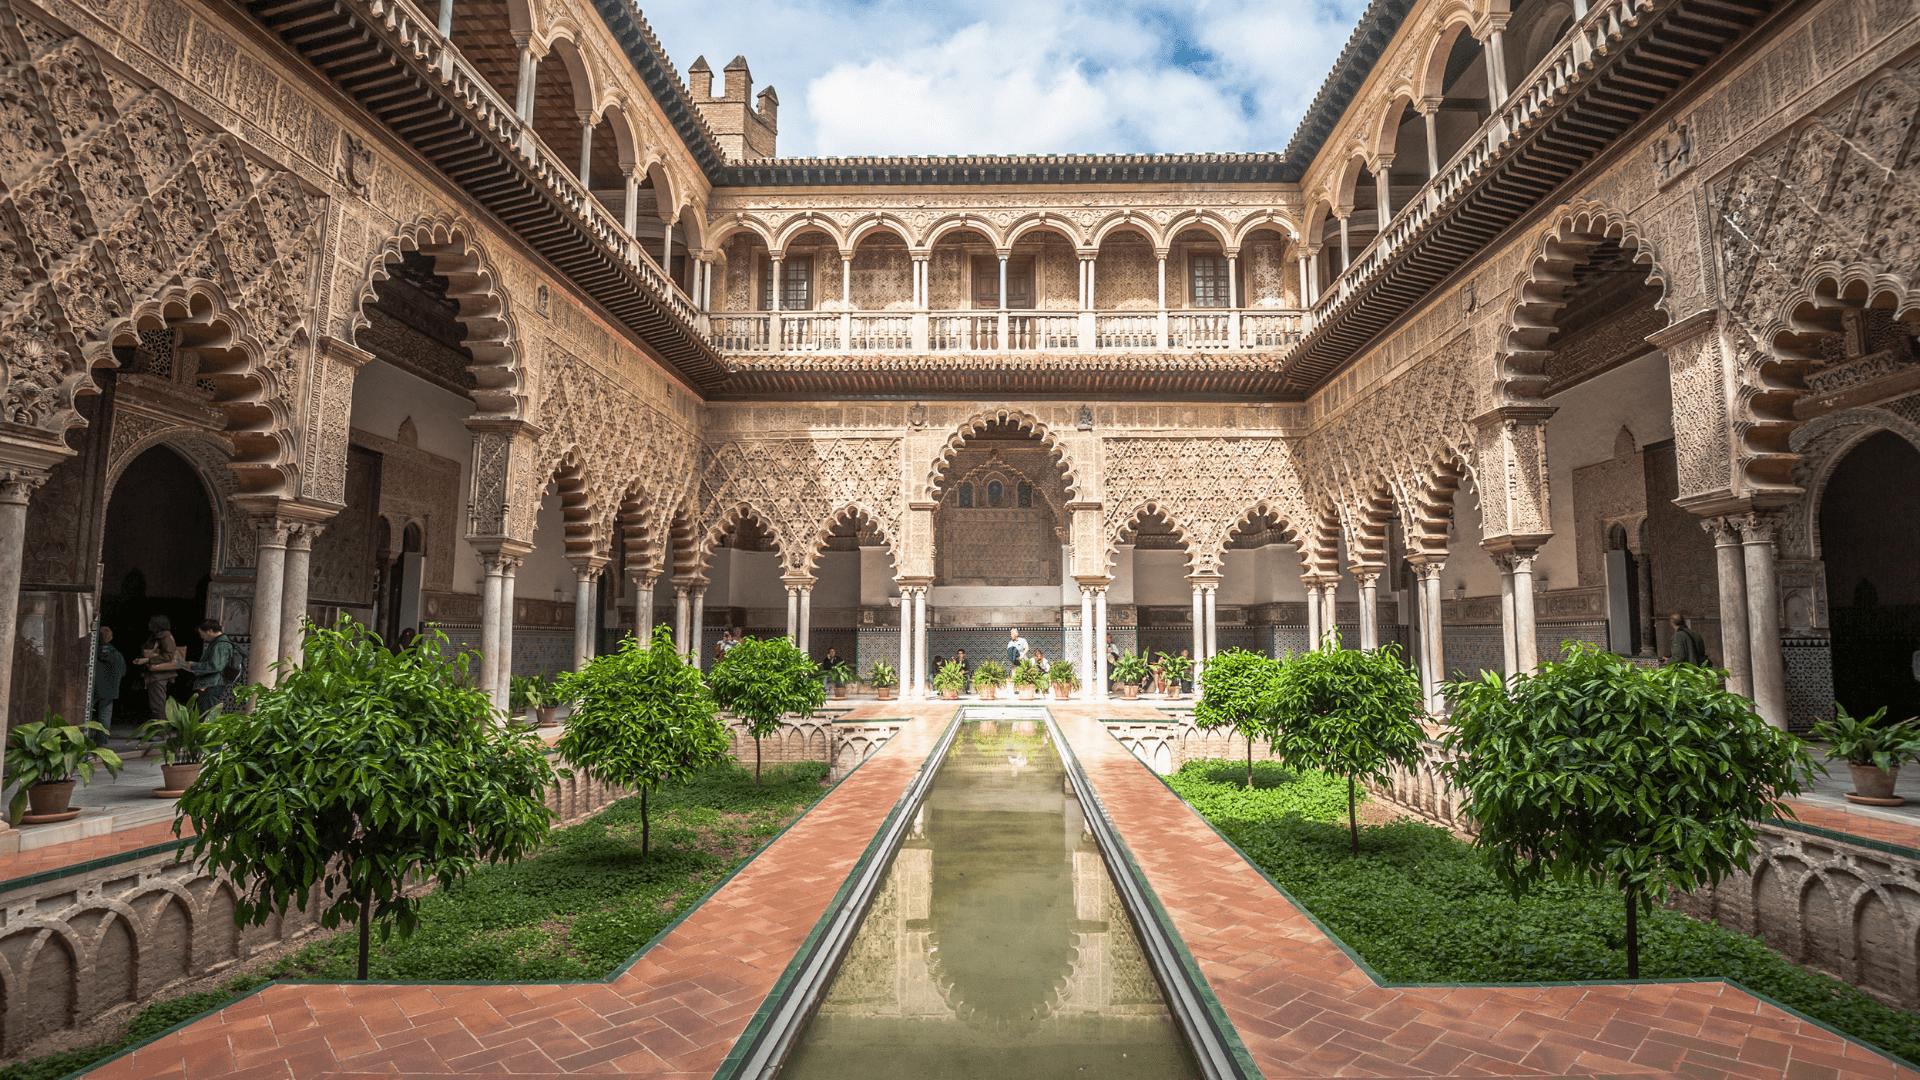 Royal Alcázar - prabangūs rūmai Sevilijoje